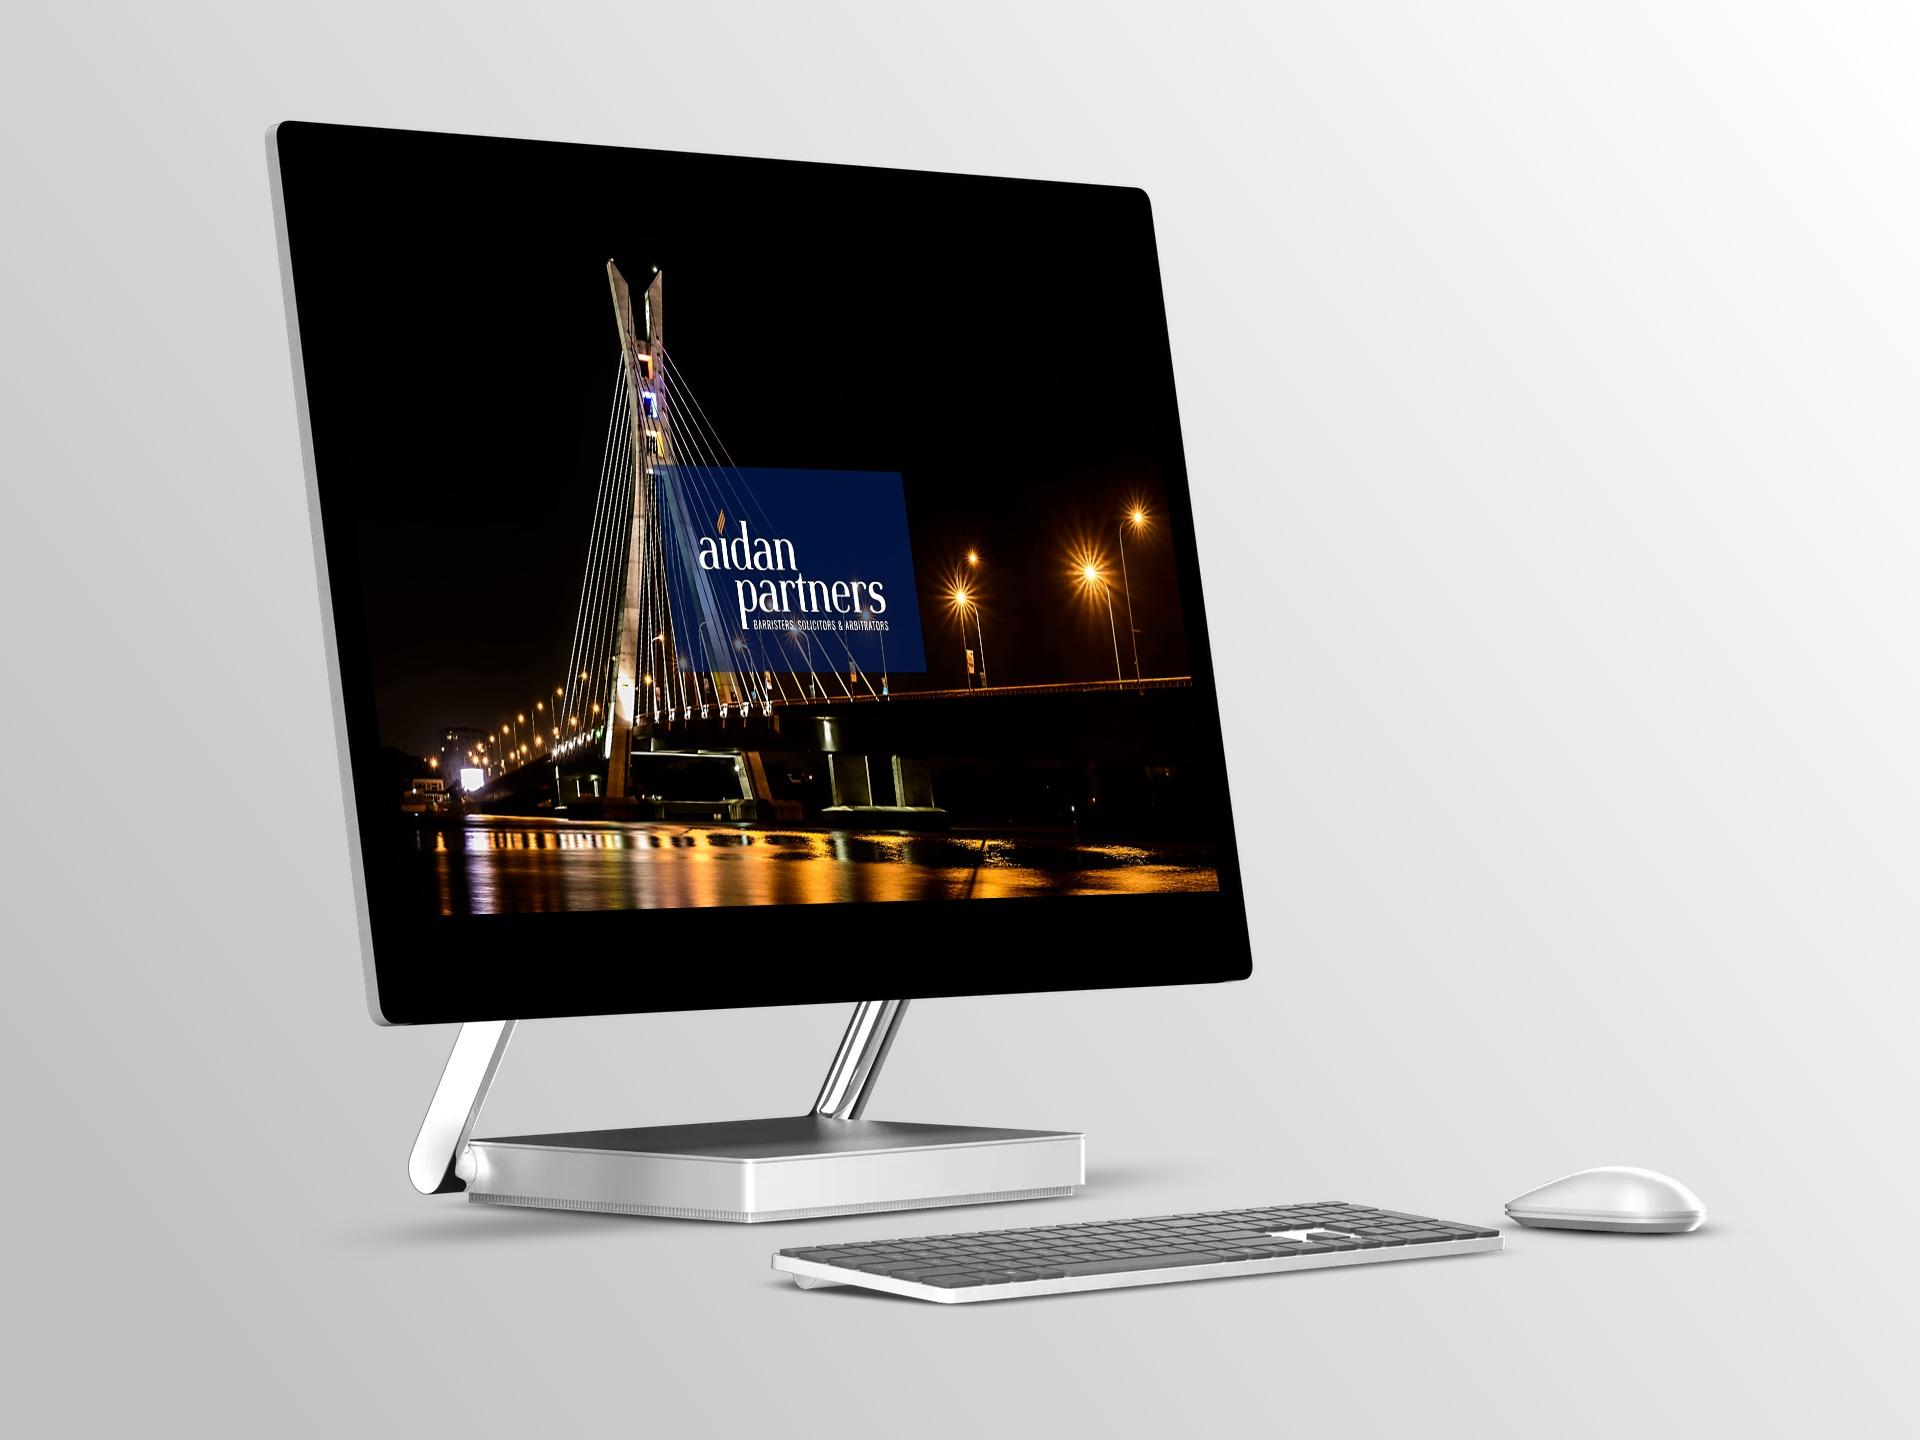 Aidan Partners - Landing Page